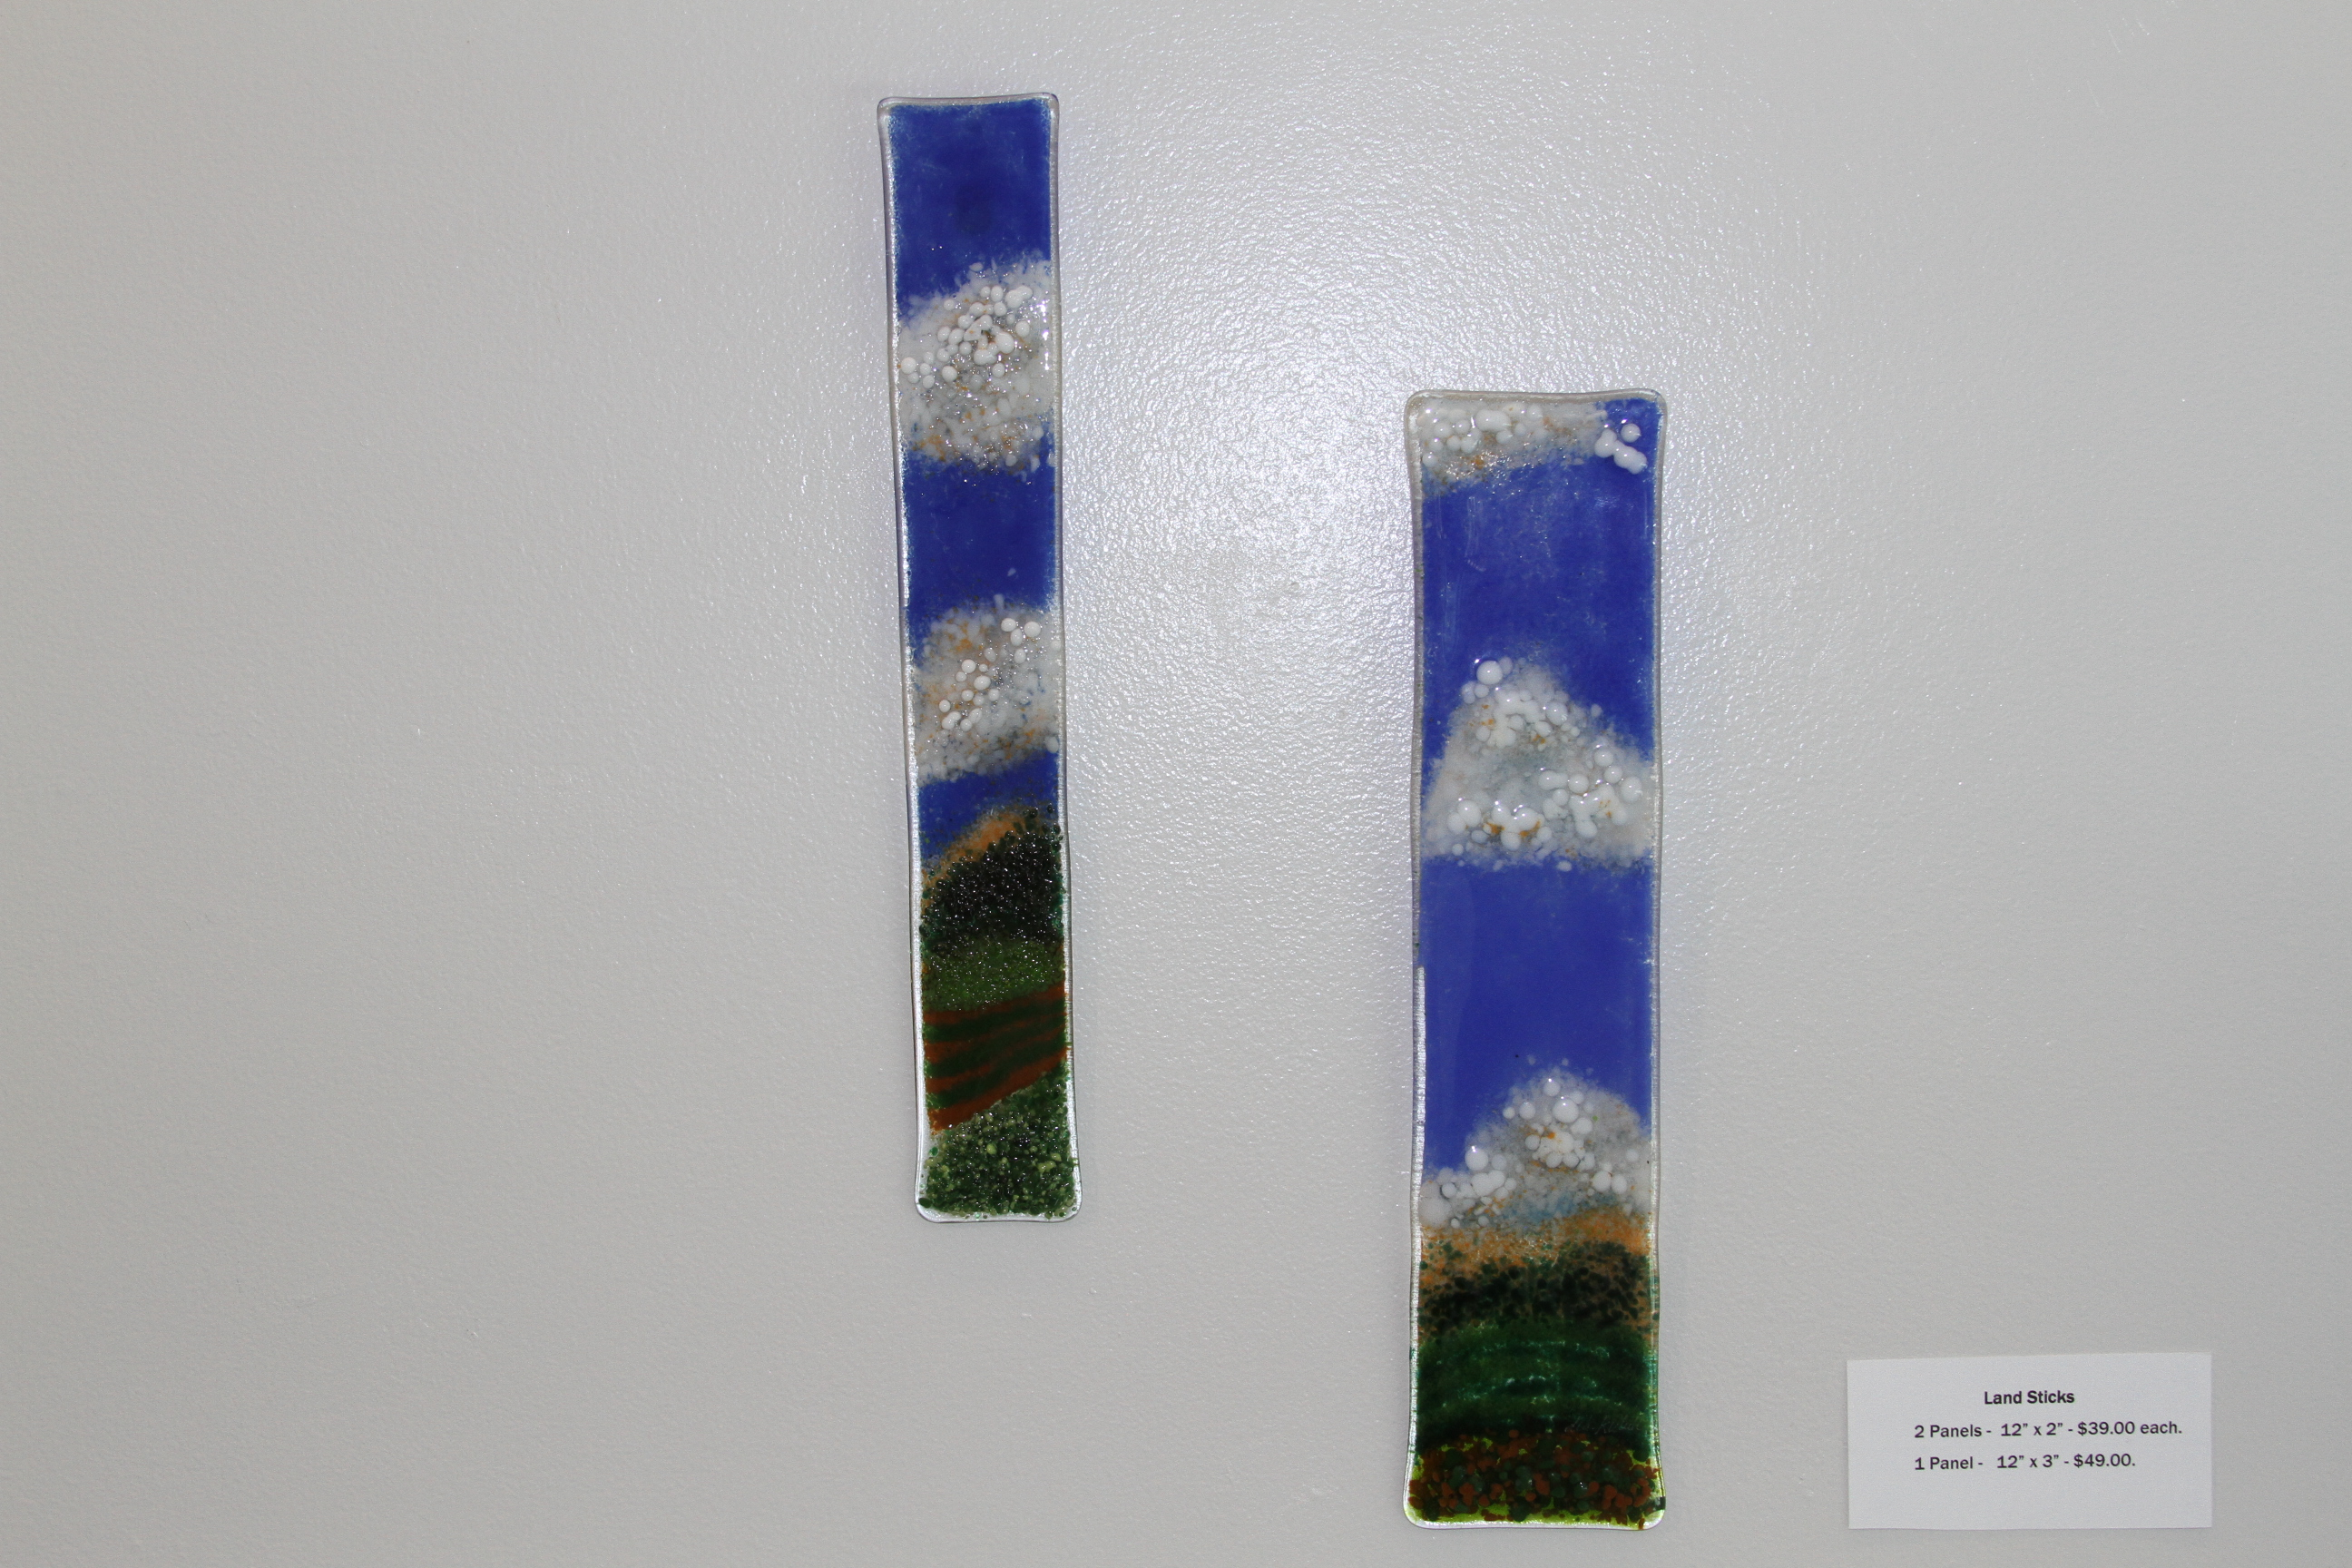 Land Sticks